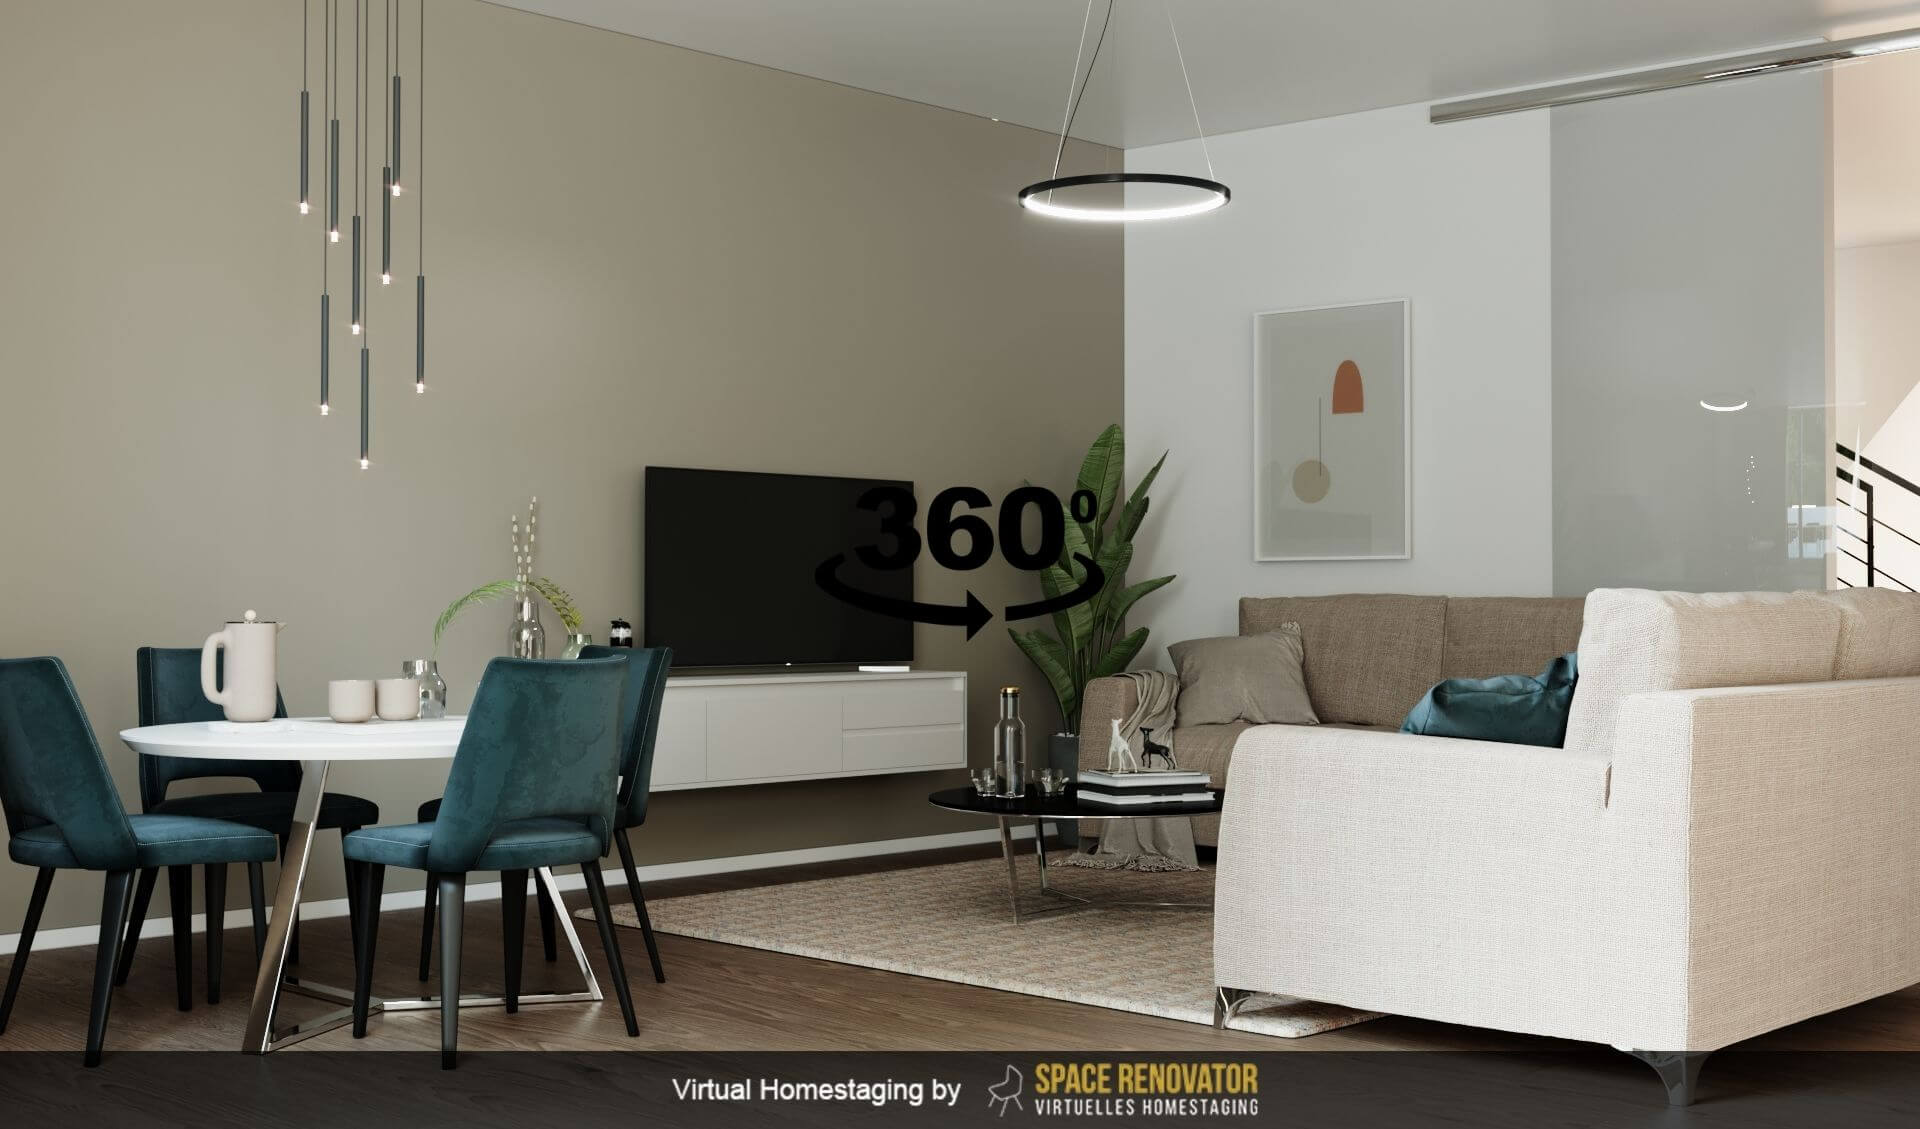 360GradVisualisierung_2